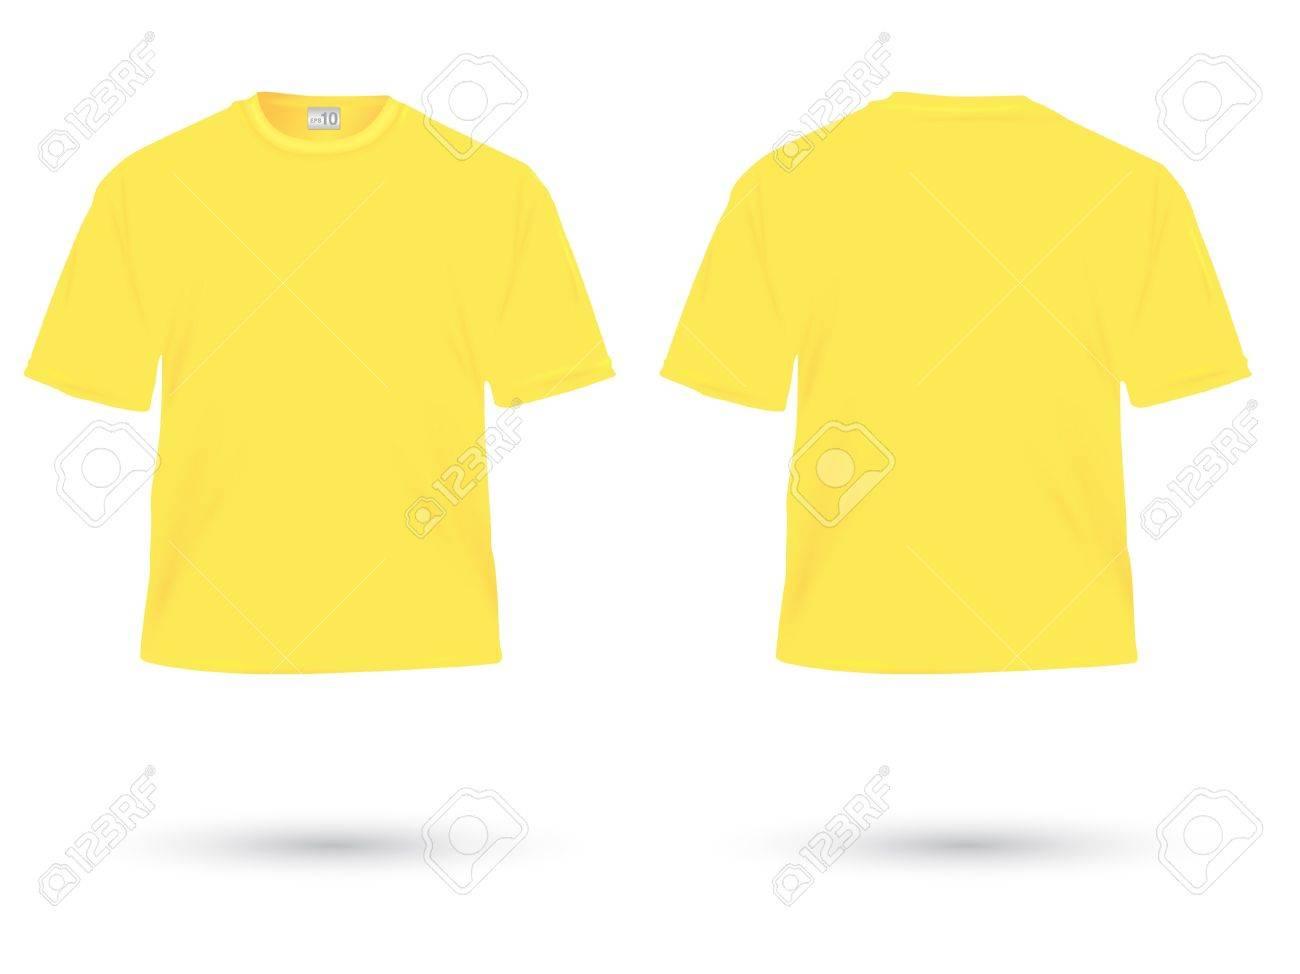 yellow t-shirt illustration on white Stock Vector - 20984883